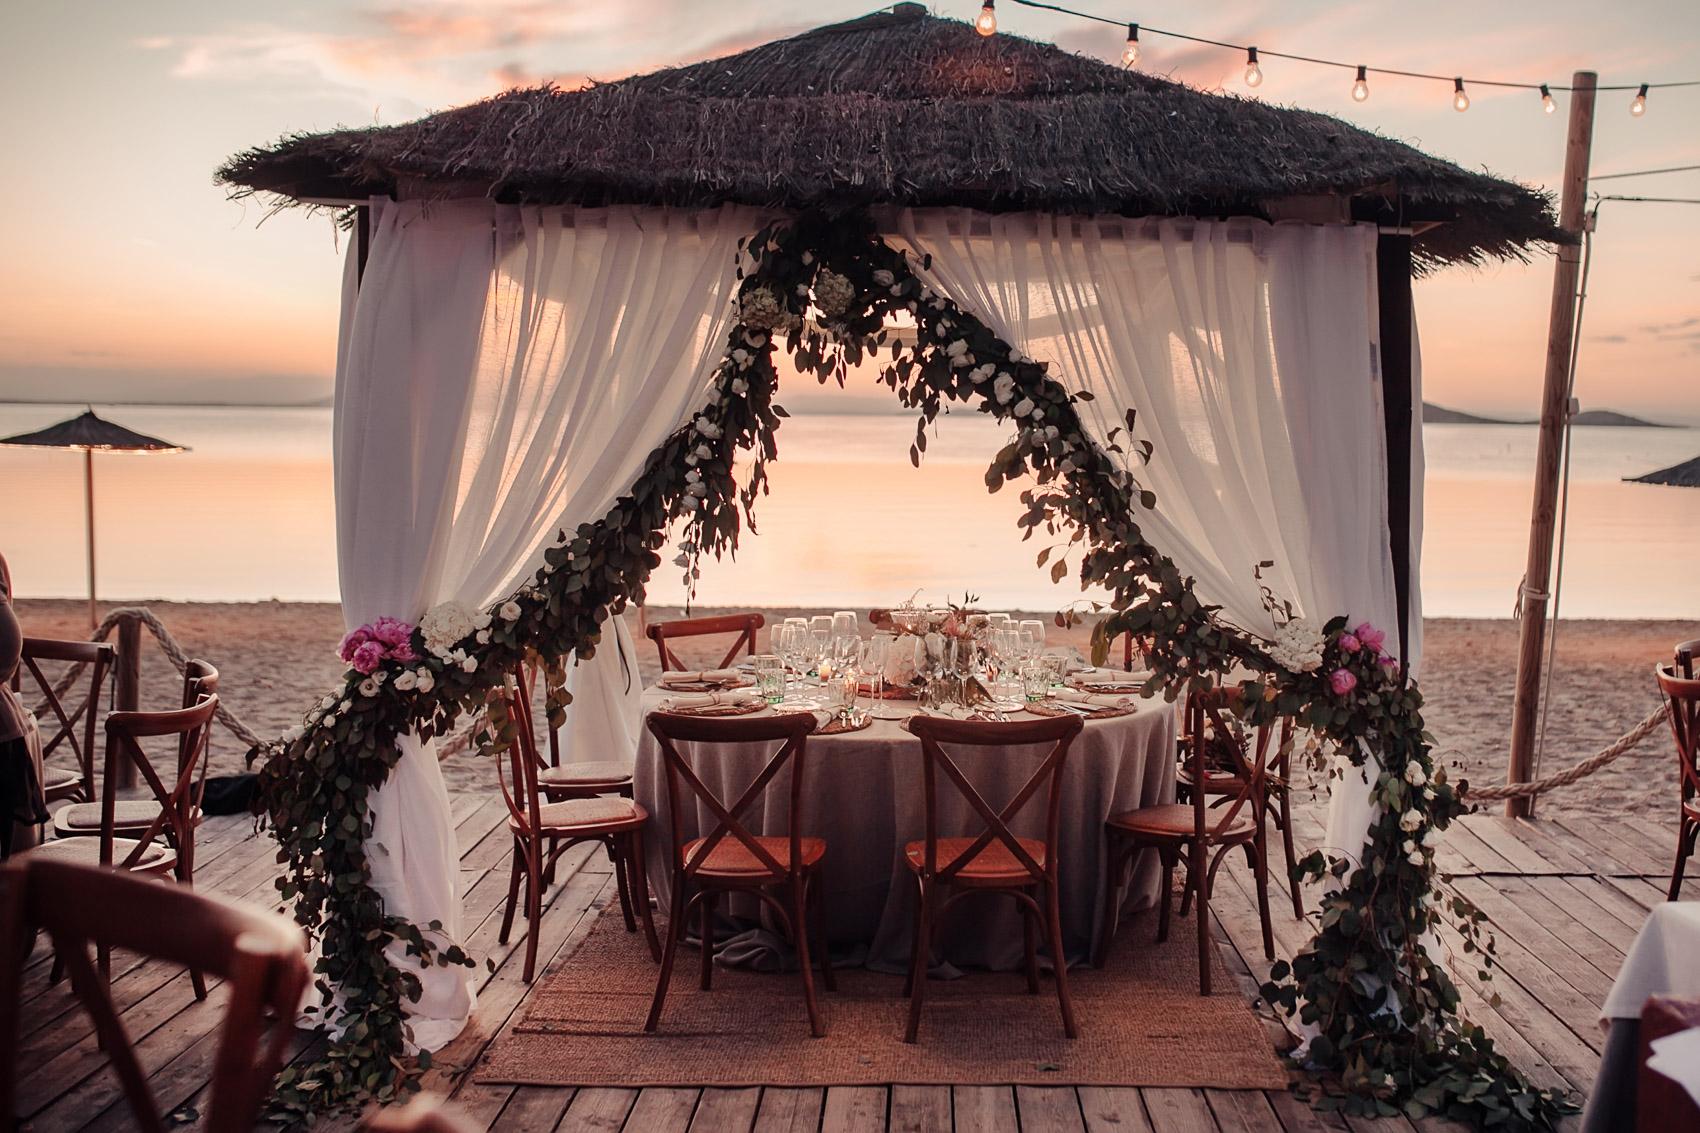 retaurante beach decoracion valisse mesas detalle flores